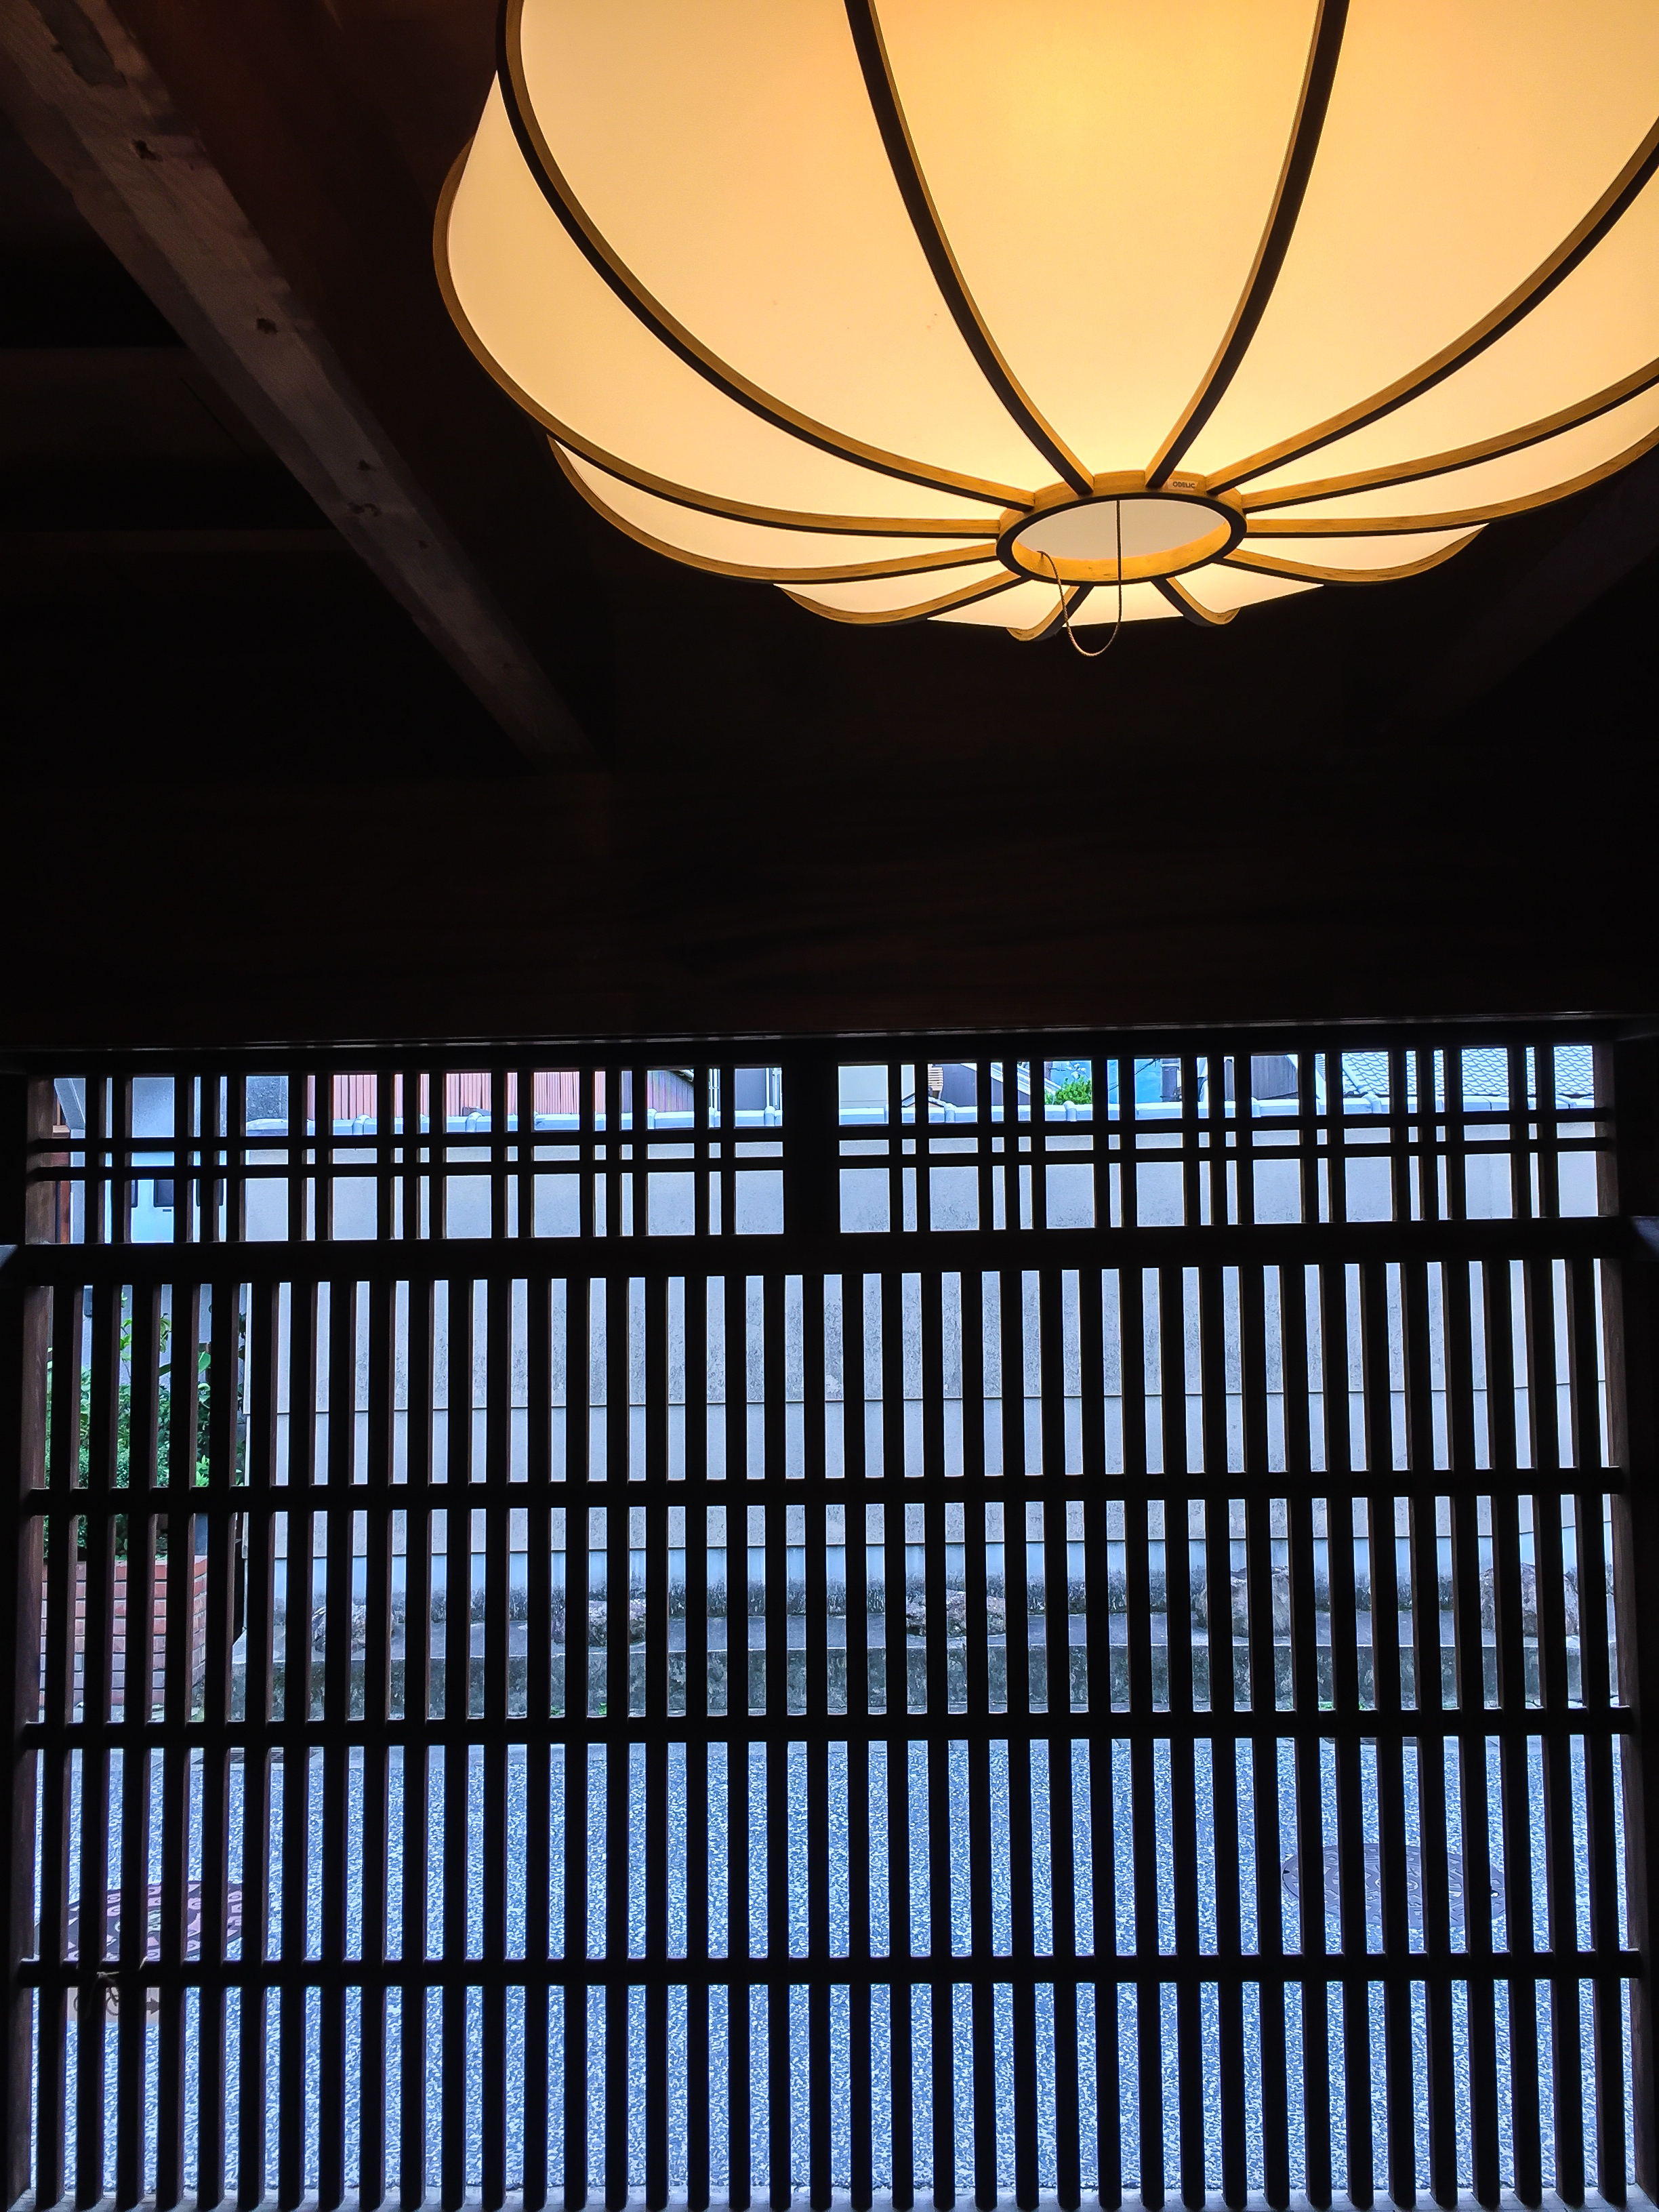 Naramachi Koshino Ie, Nara, Japan, Asia   DoLessGetMoreDone.com   Where Do You Feel Right At Home?